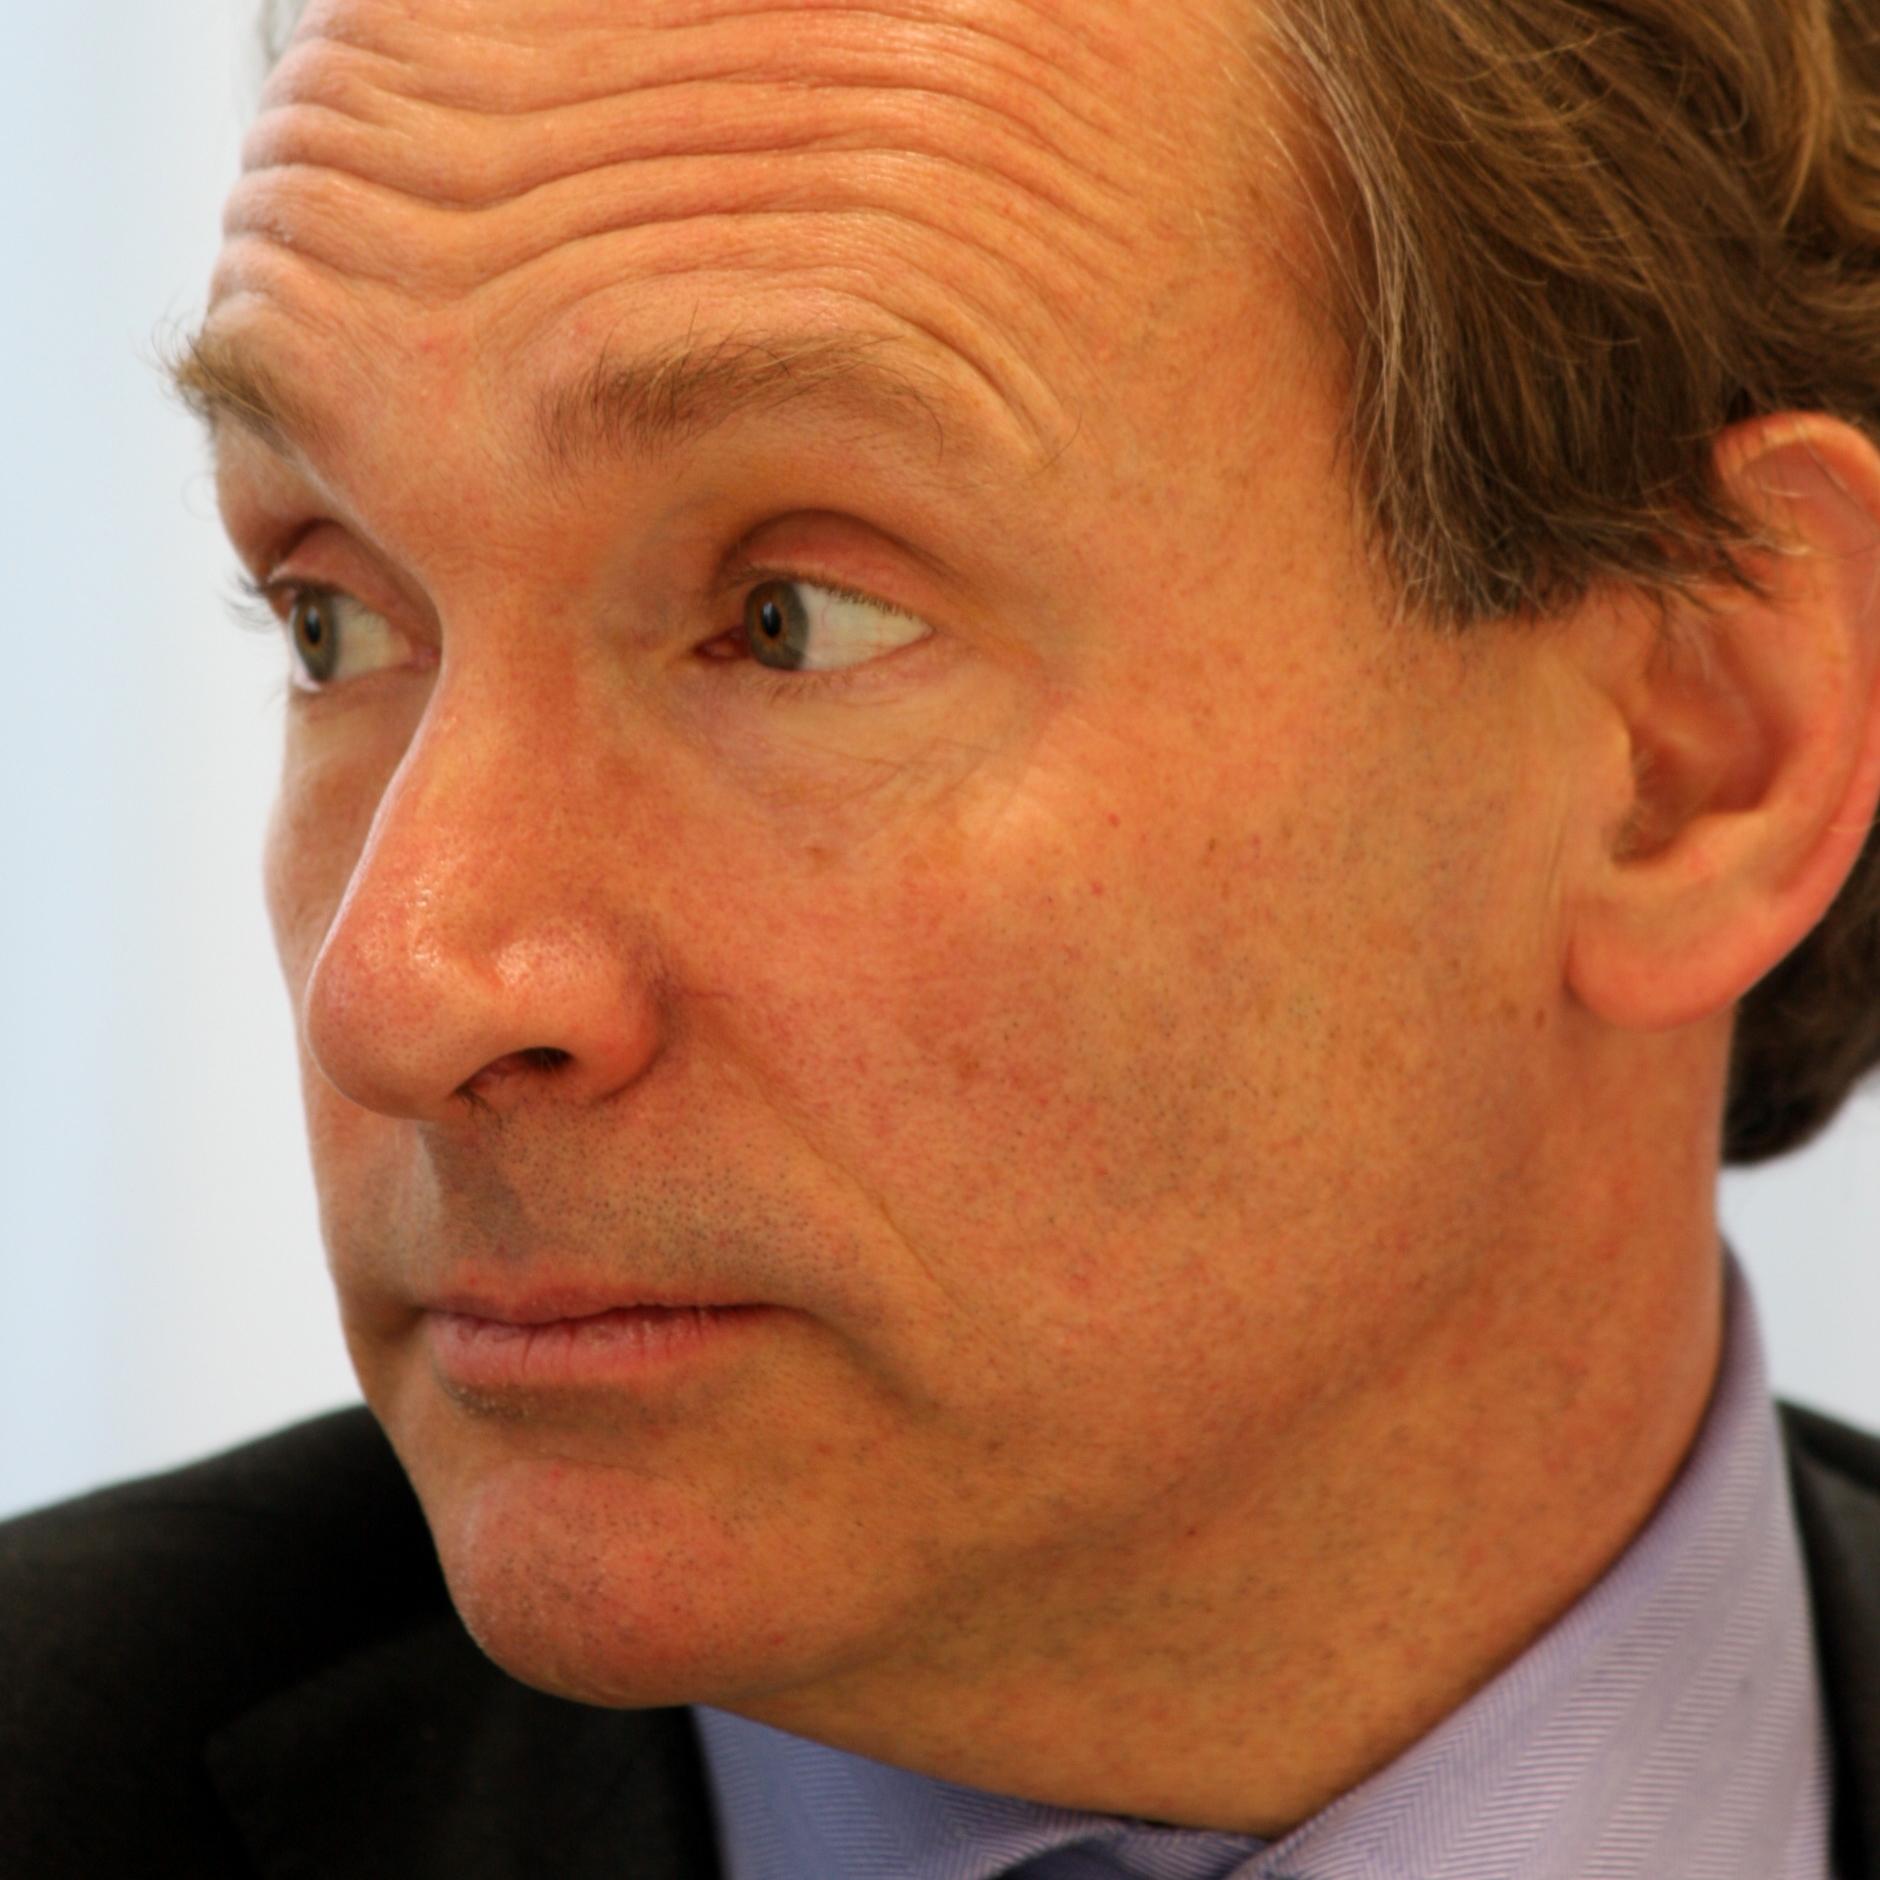 Tim_Berners-Lee_closeup.jpg